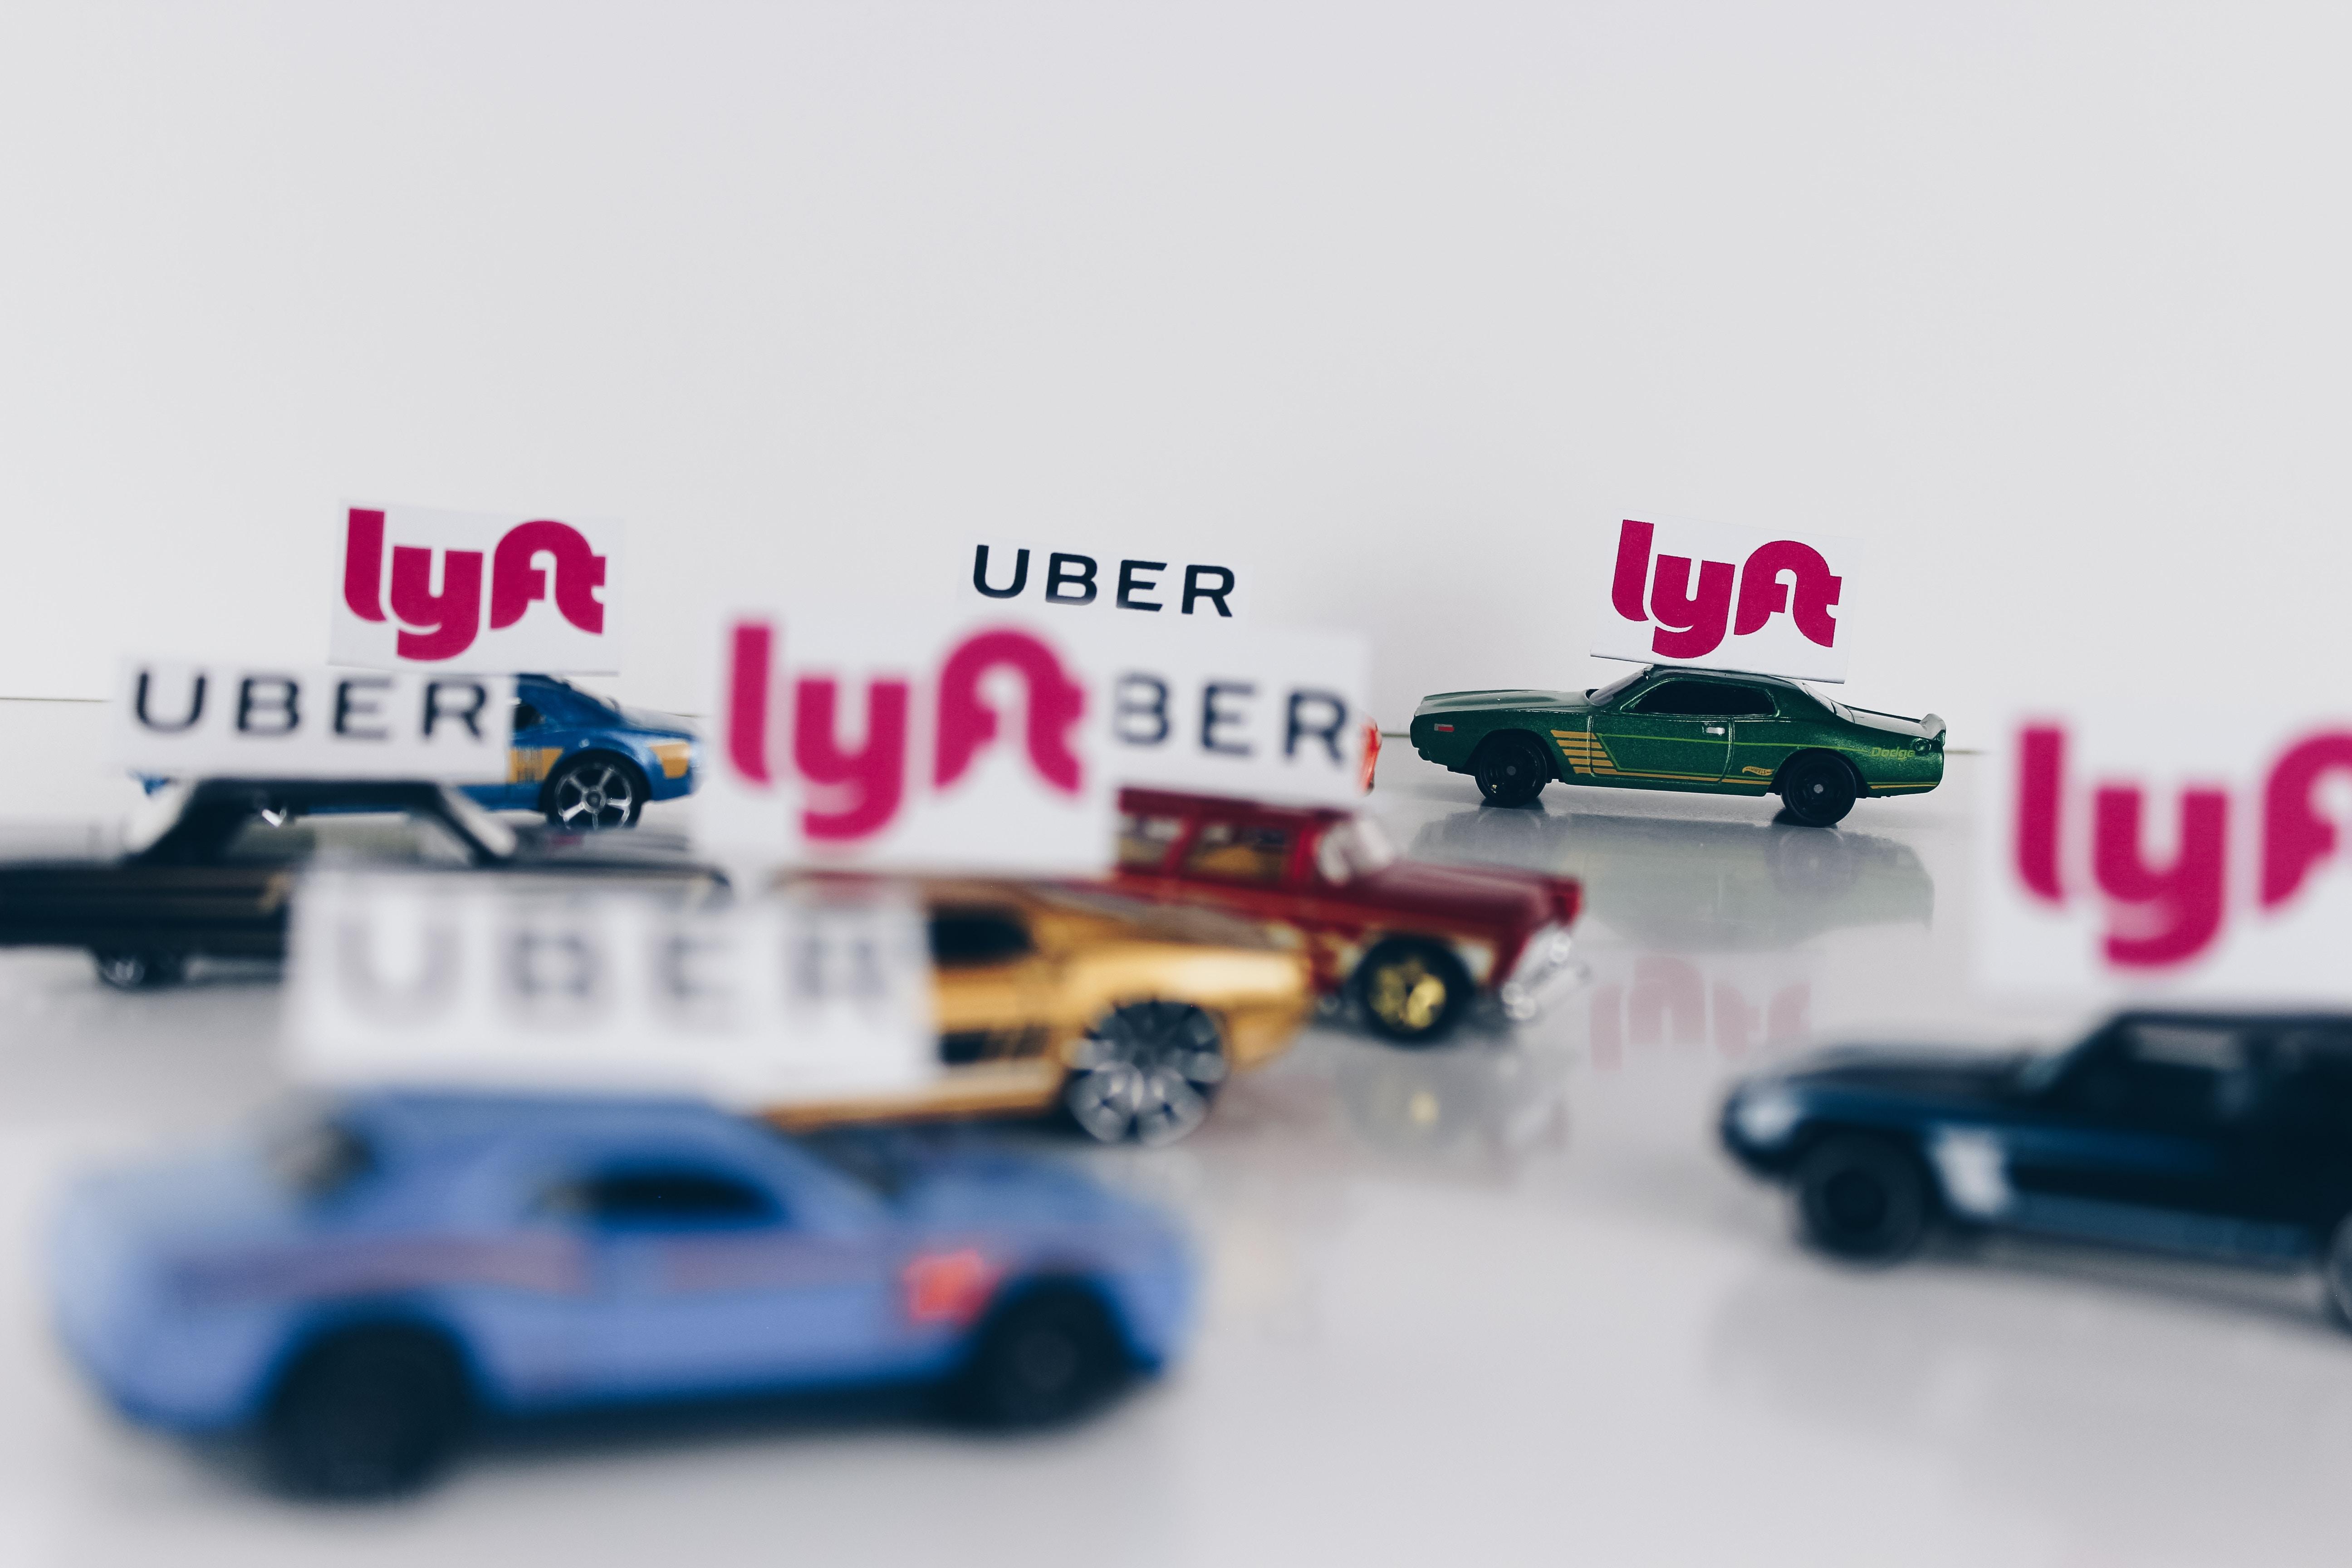 Uber vs. Lyft: The Ridehail Showdown Thumbnail